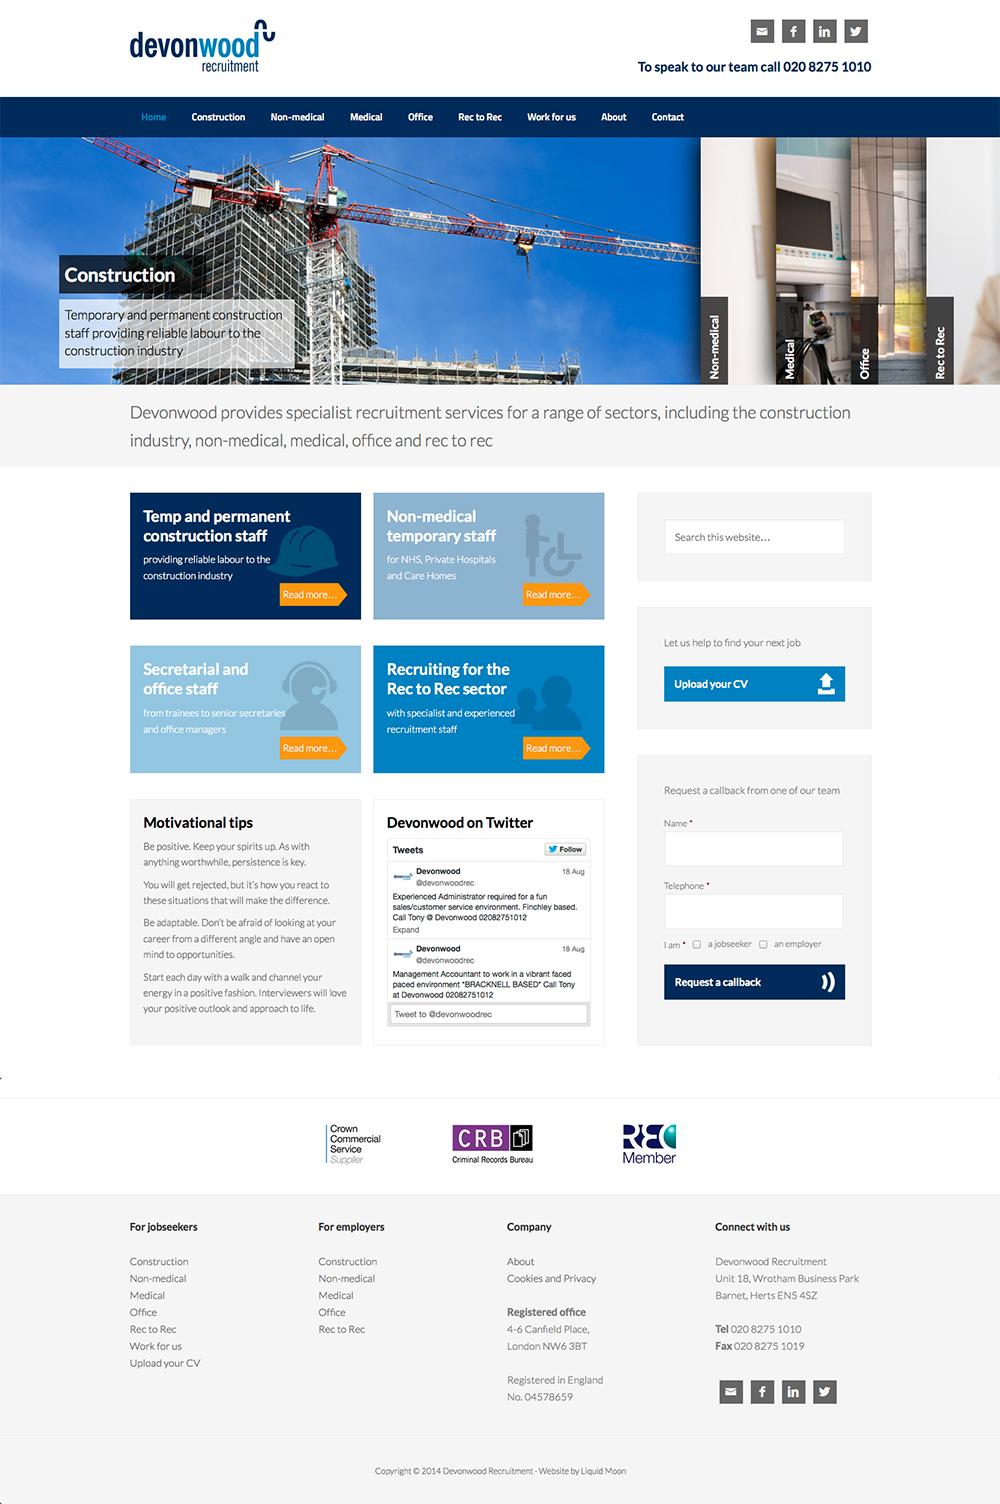 Devonwood Recruitment website